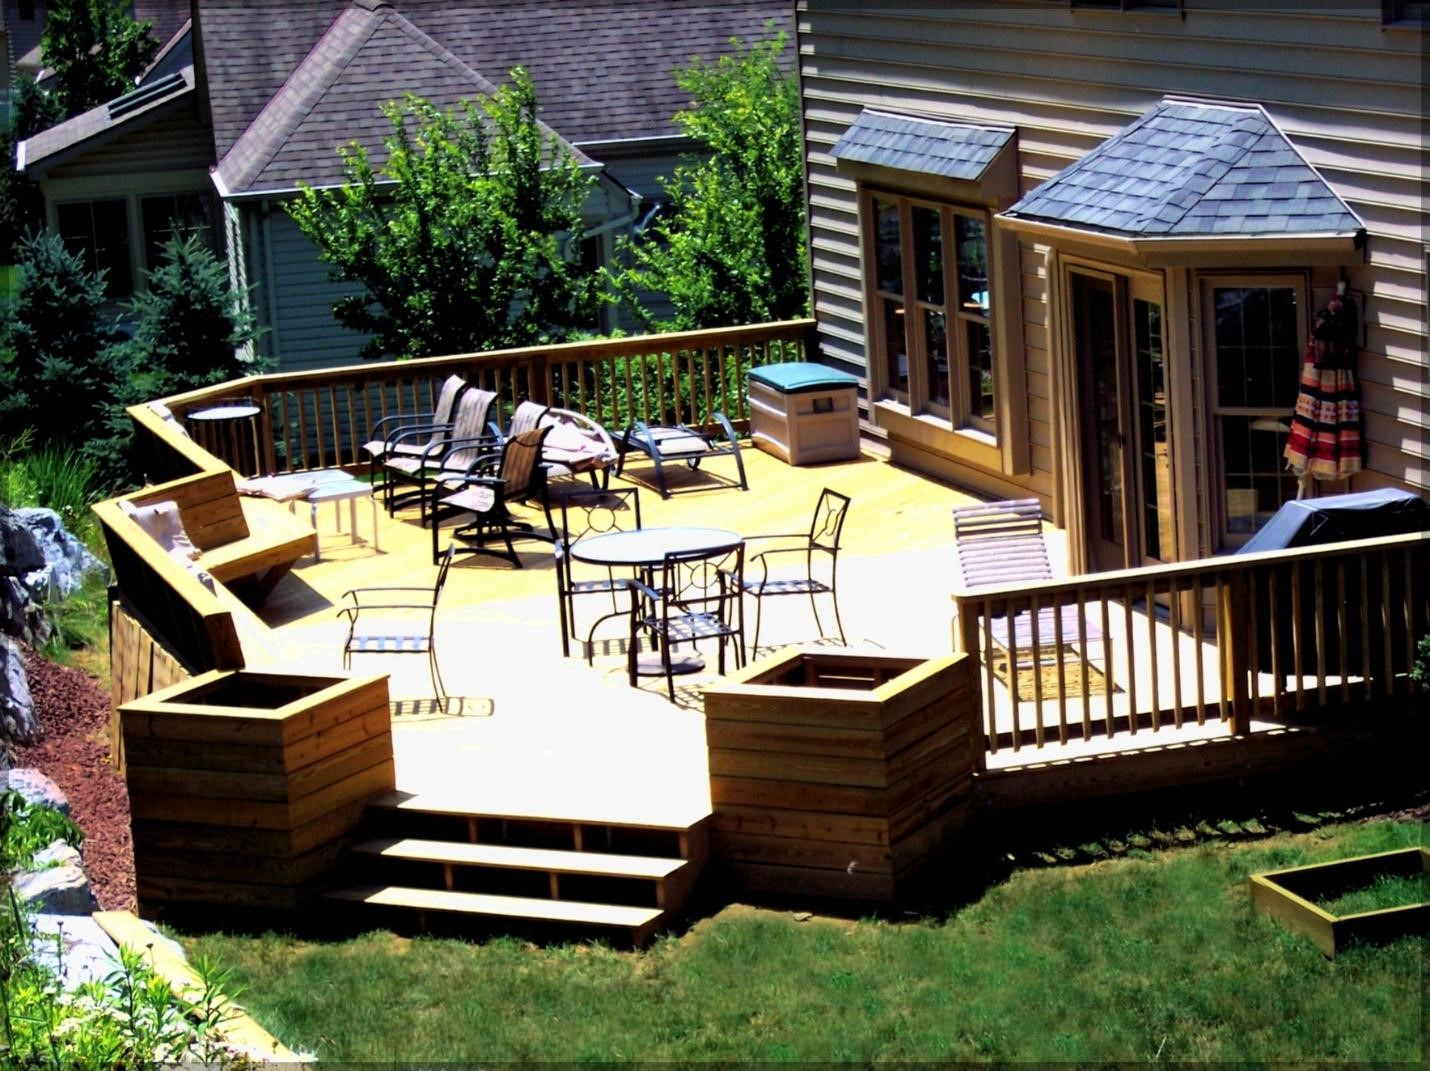 3.SIMPHOME.COM Backyard Patio with Wooden Deck